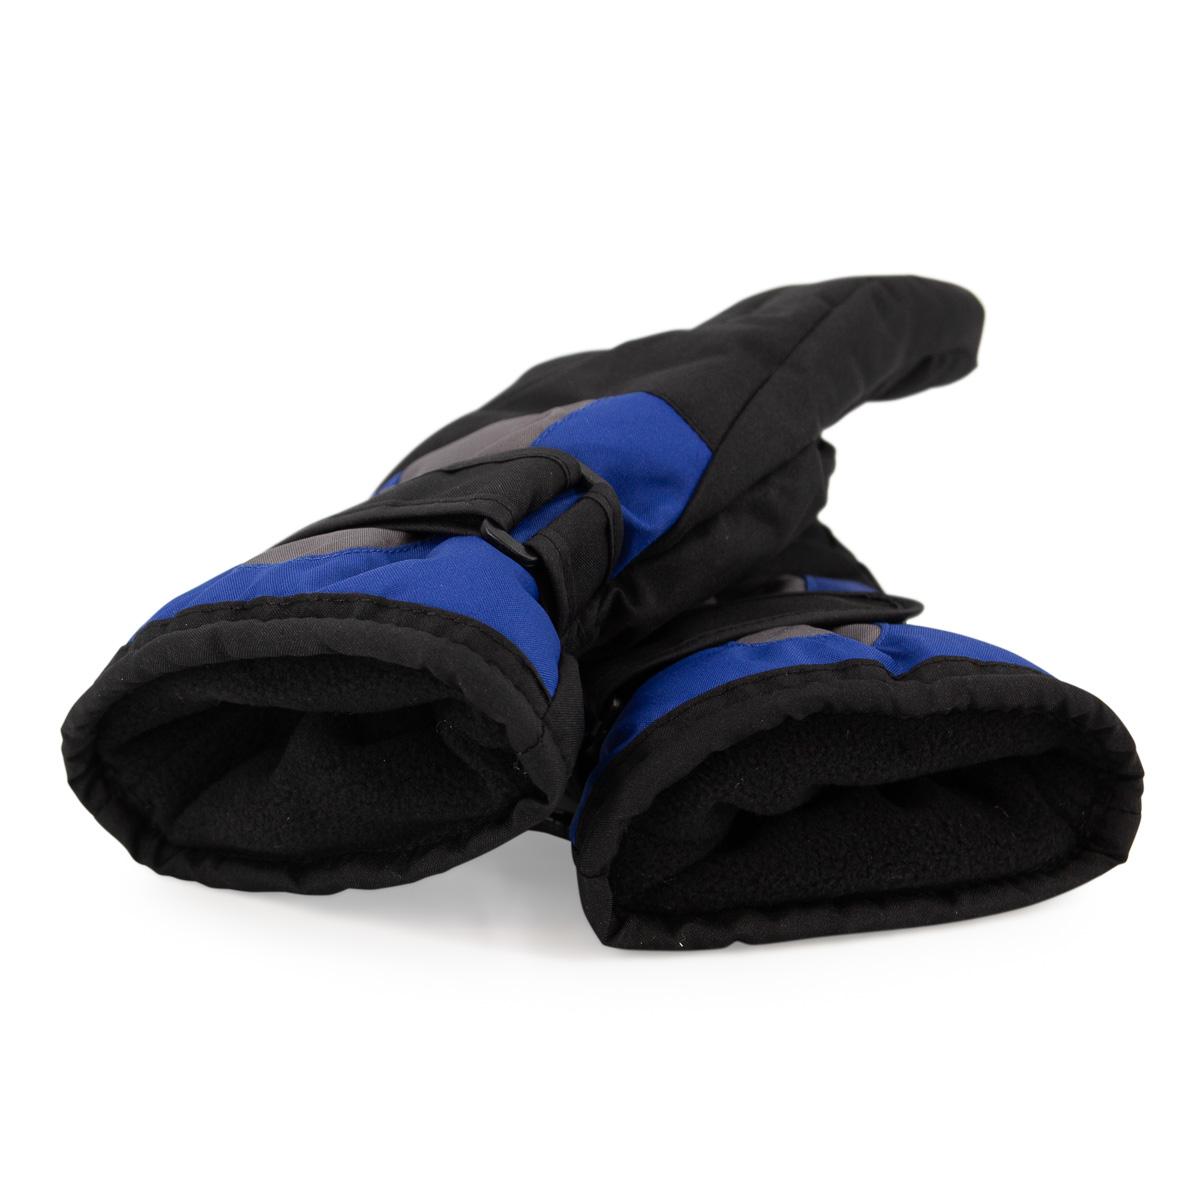 Polar Extreme Boys Ski Gloves Adjustable Insulated Thermal Youth Warm Fleece